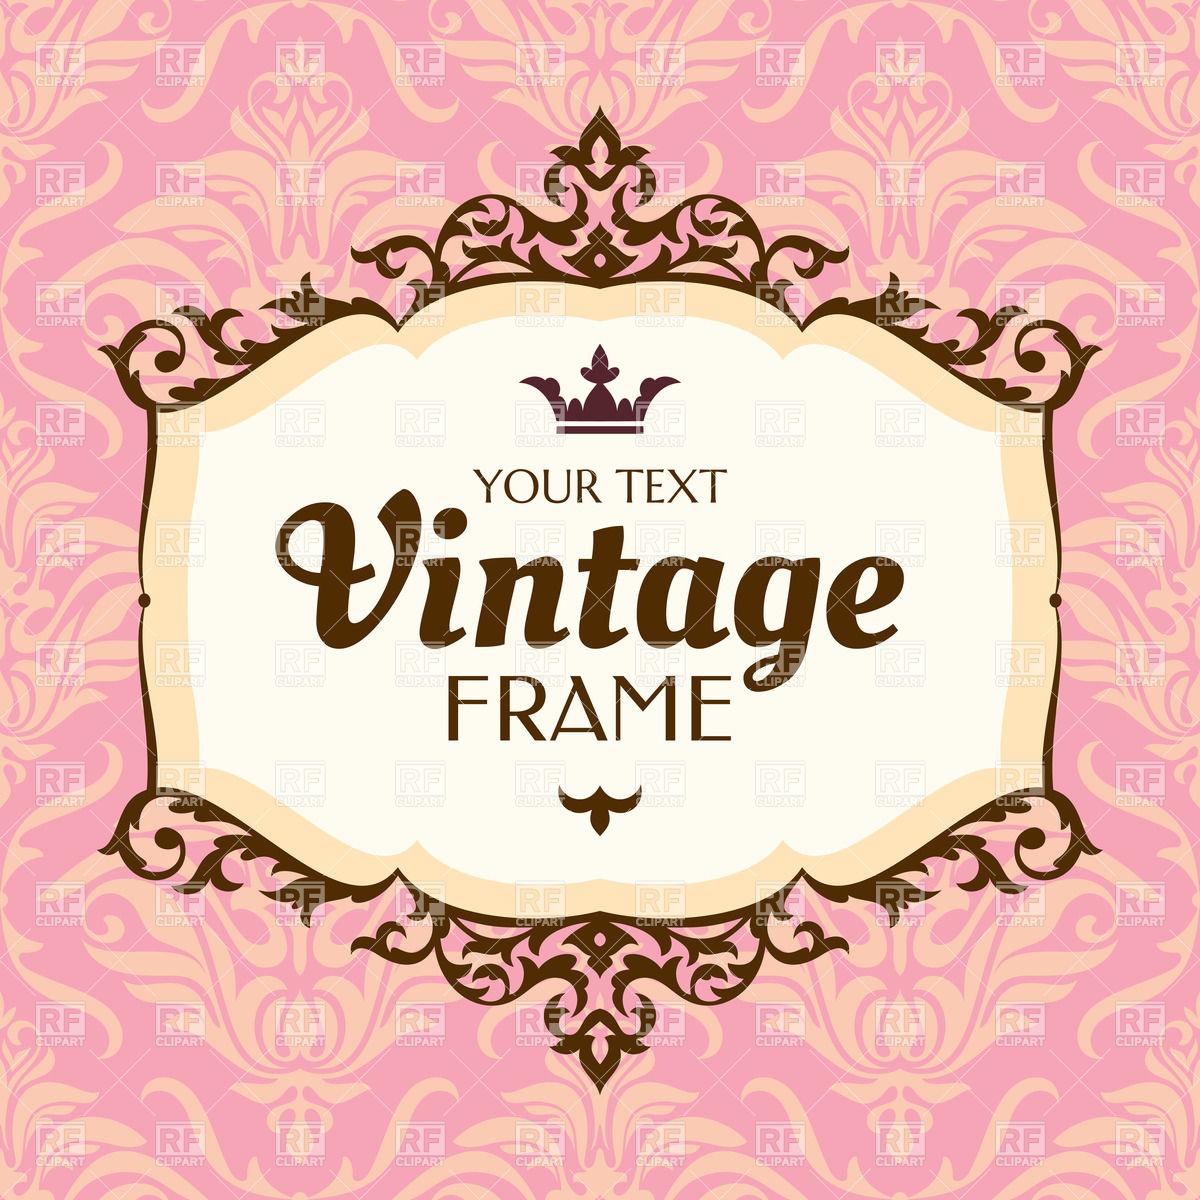 1200x1200 Pink Vintage Floral Frame Vector Image Vector Artwork Of Borders